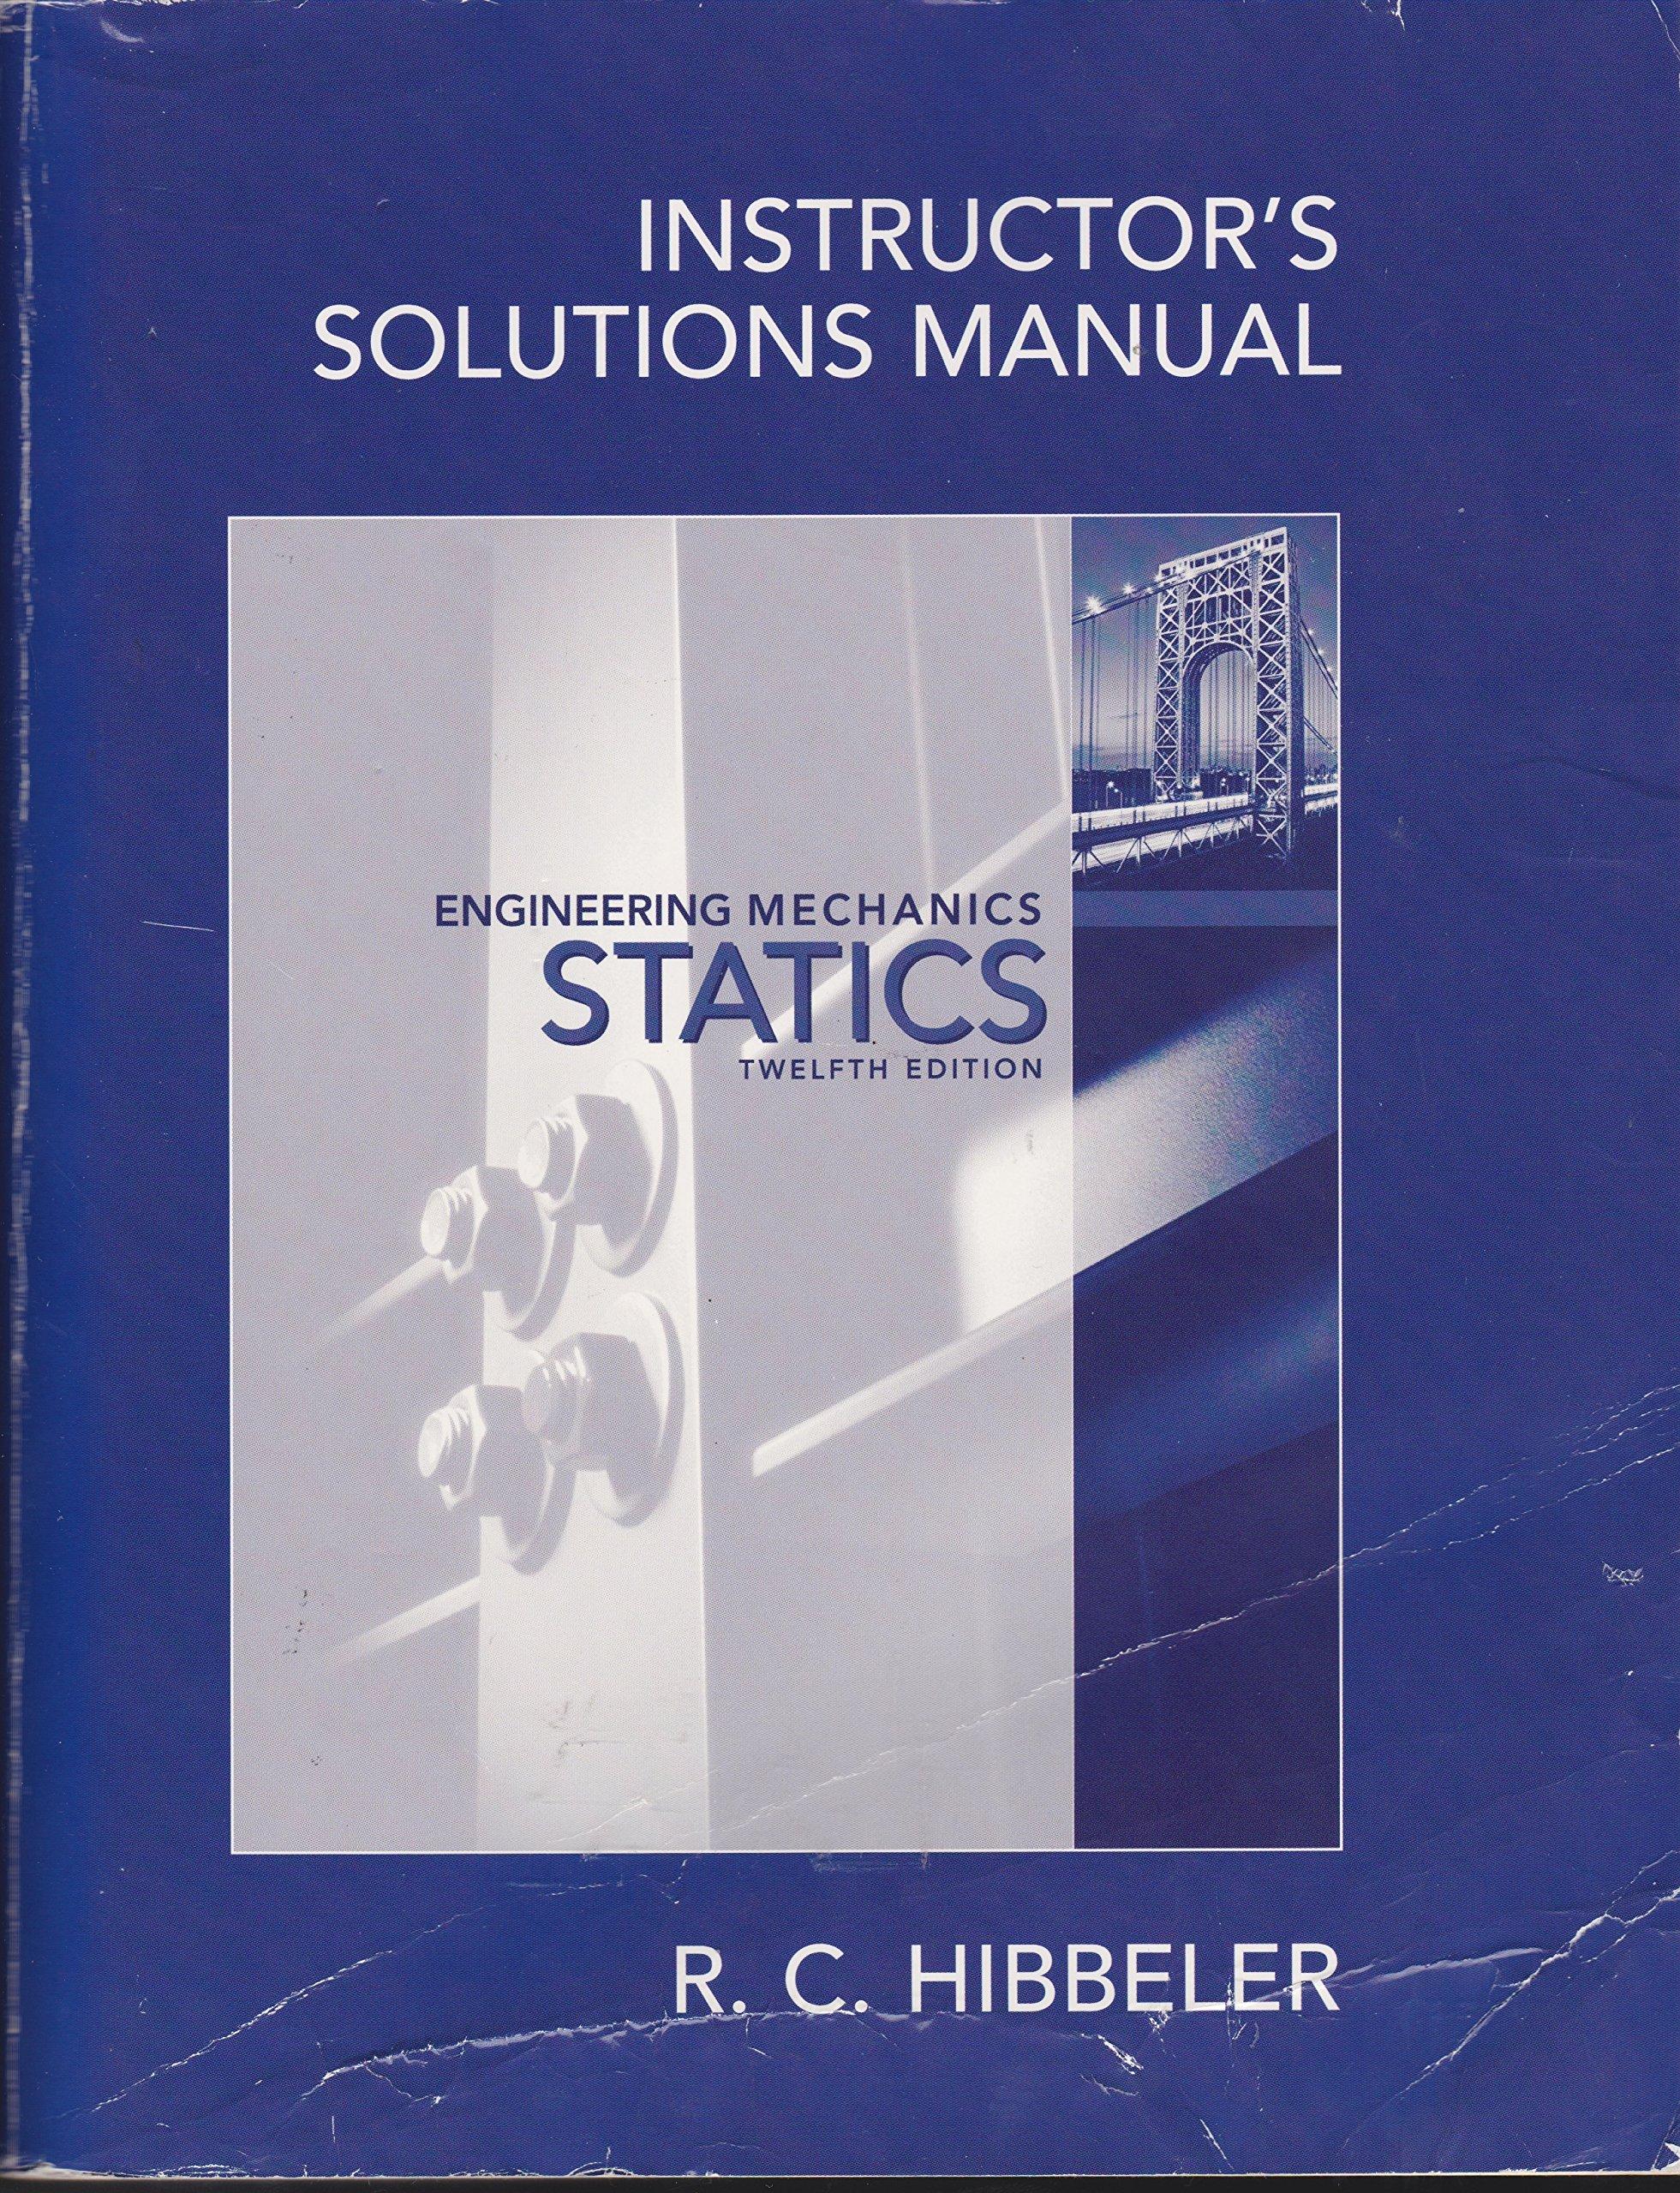 Instructor's Solutions Manual Engineering Mechanics Statics 12th Edition:  R.C. Hibbeler: 9780136091844: Amazon.com: Books